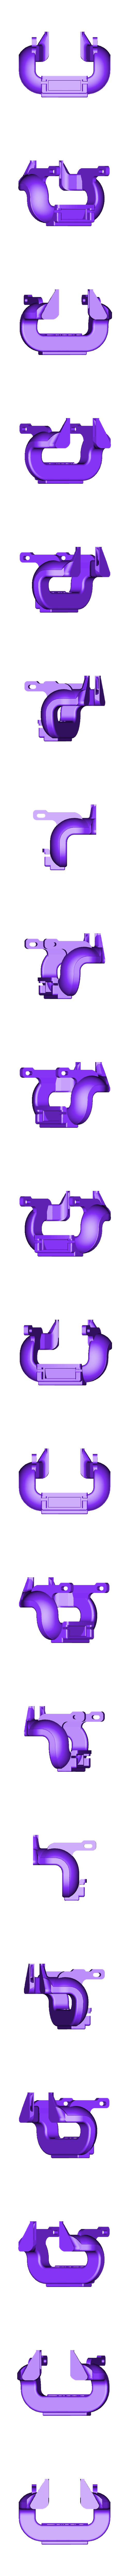 fanduct.stl Download free STL file Petsfang Micrometer Adapter • 3D print model, Pipapelaa